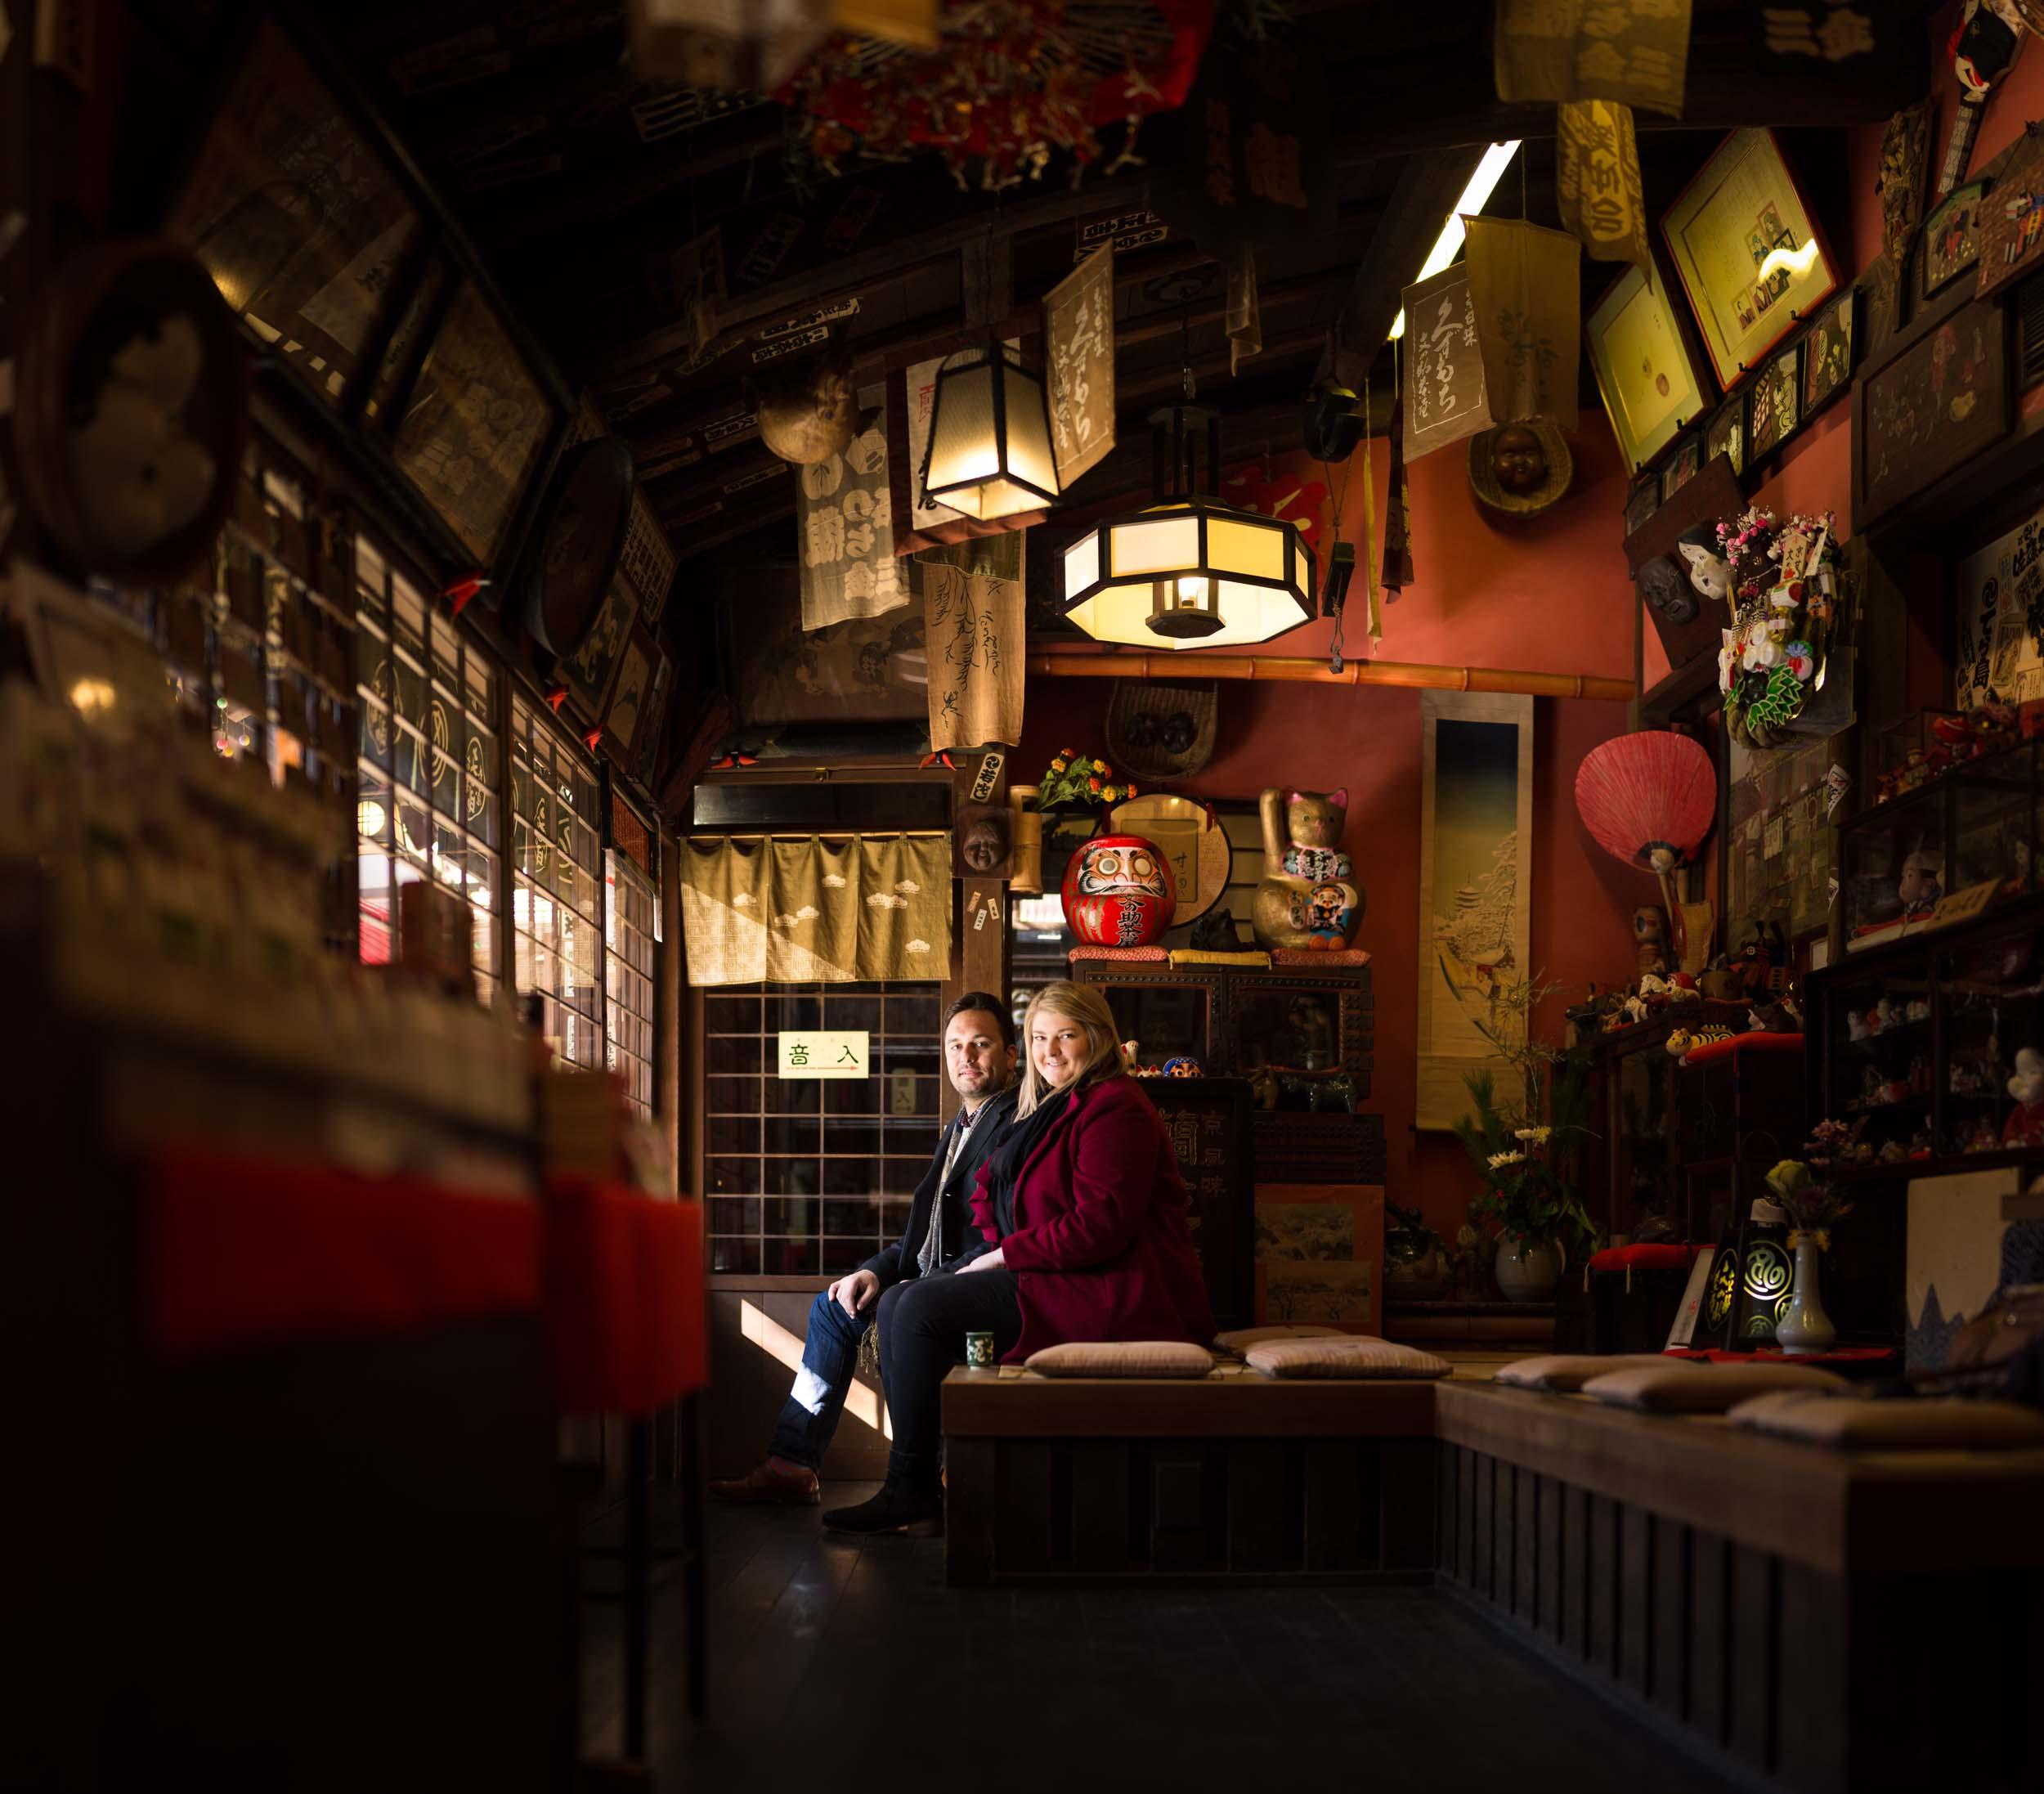 Flytographer Lucas in Kyoto